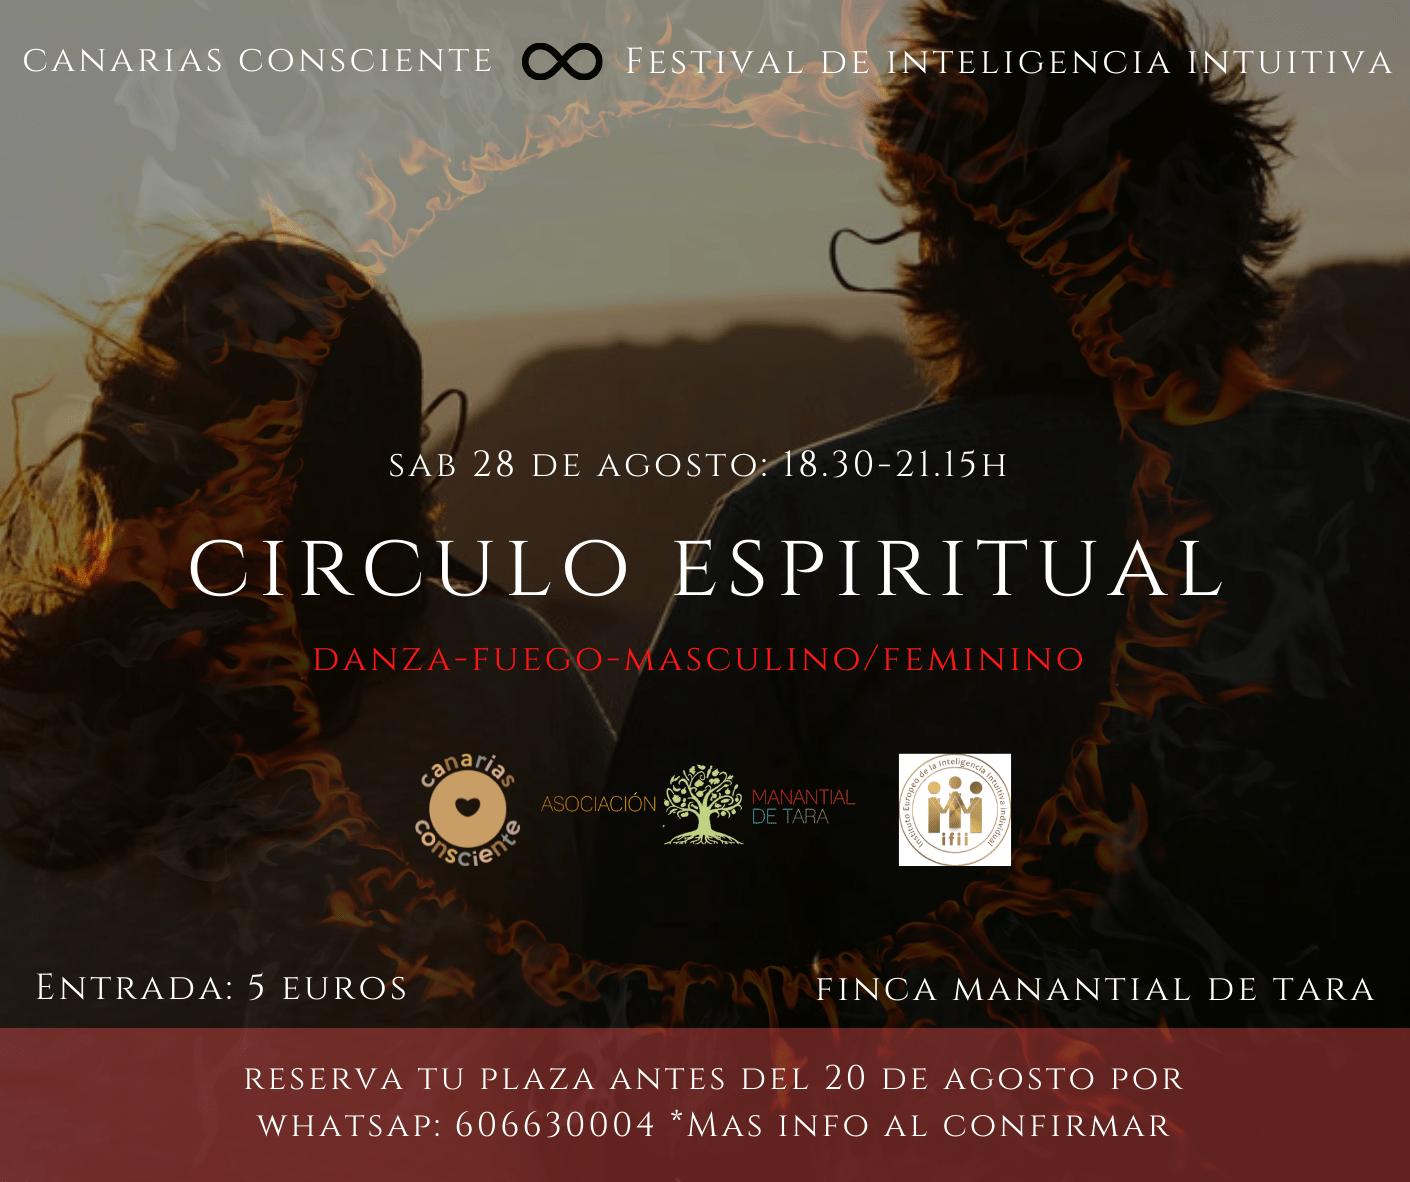 Círculo Espiritual + cena vegetariana (opcional)